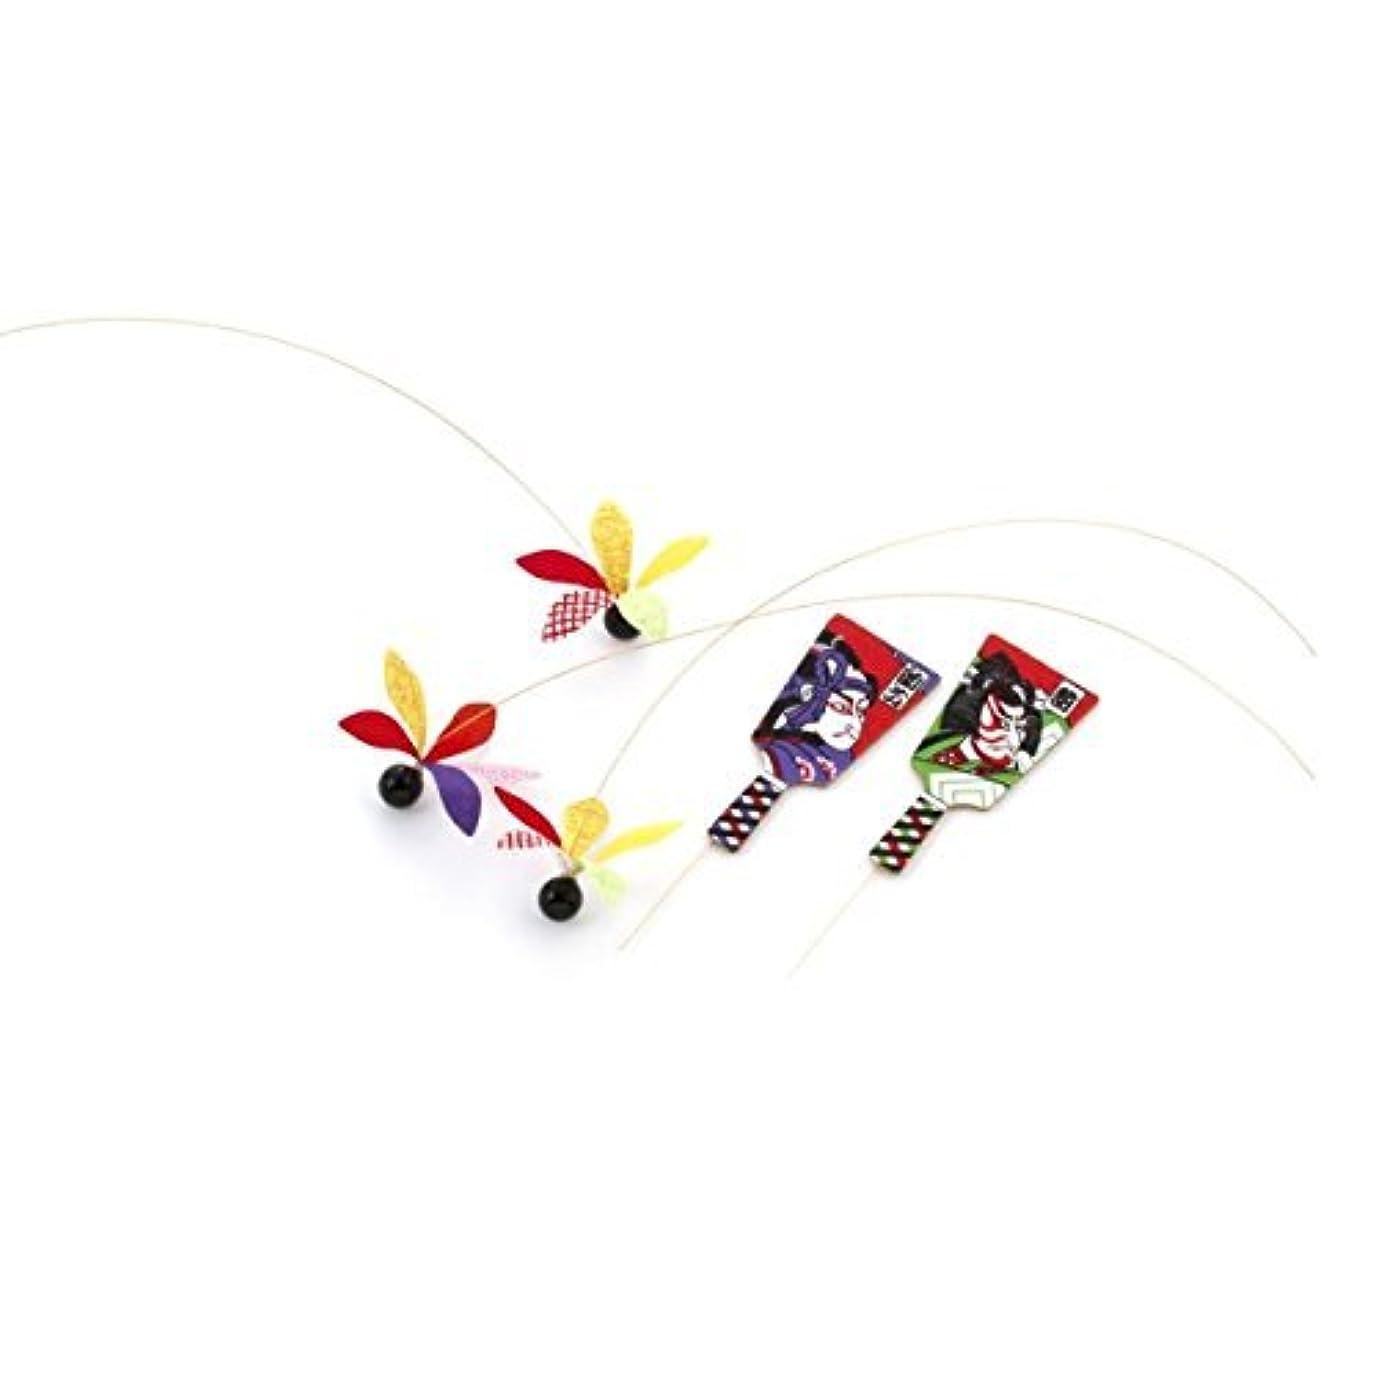 狂人利得鉛角凧(獅子頭)【お正月飾り】(DE0425)